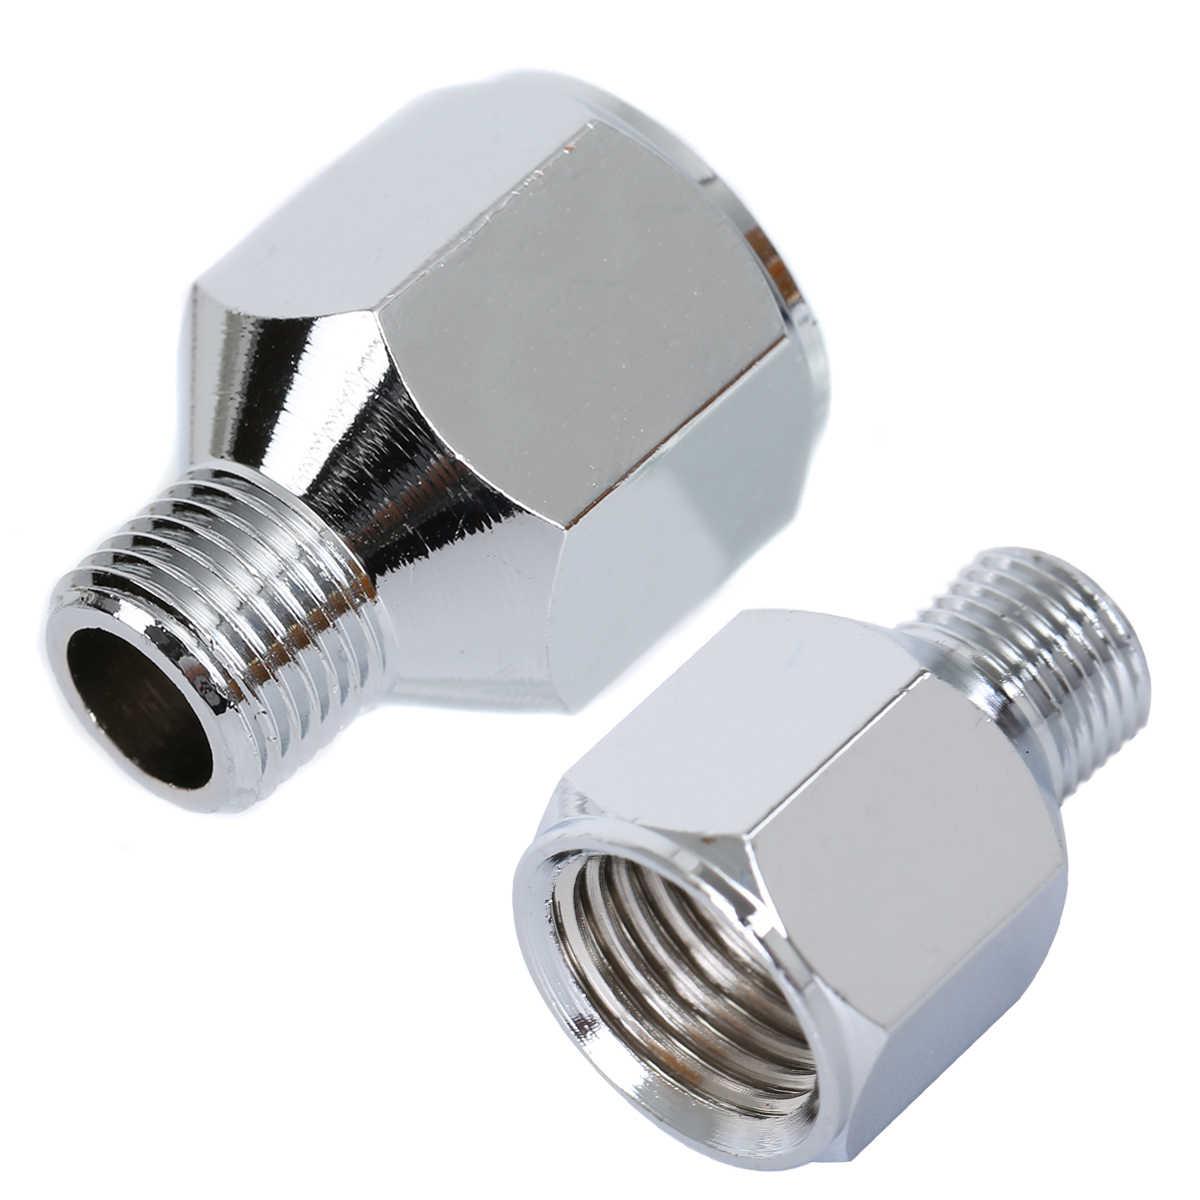 Airbrush Air Hose Quick Release Coupler Quick Connector Adaptors 1//8 Thread